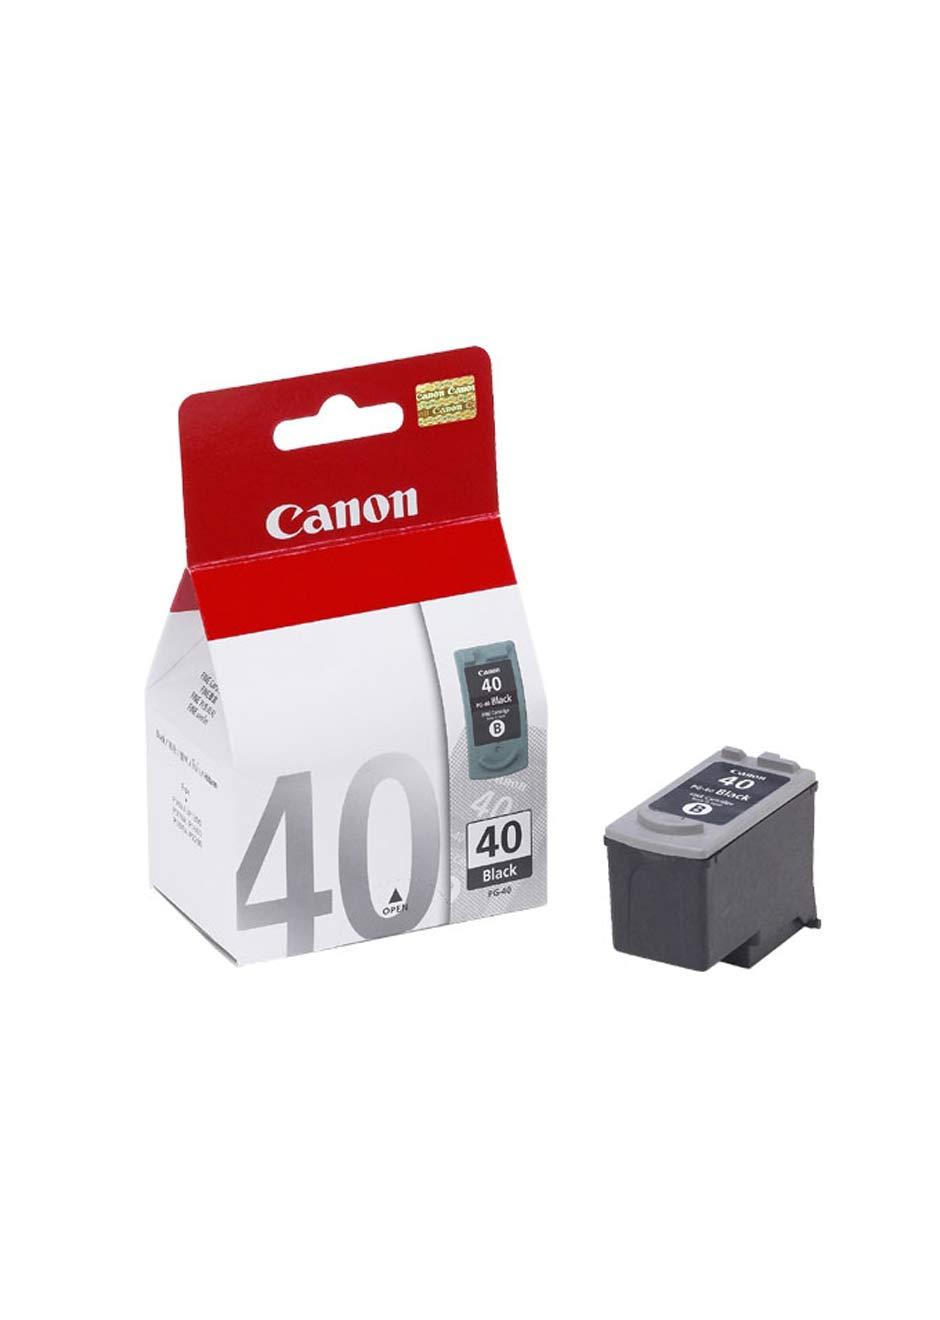 canon-40